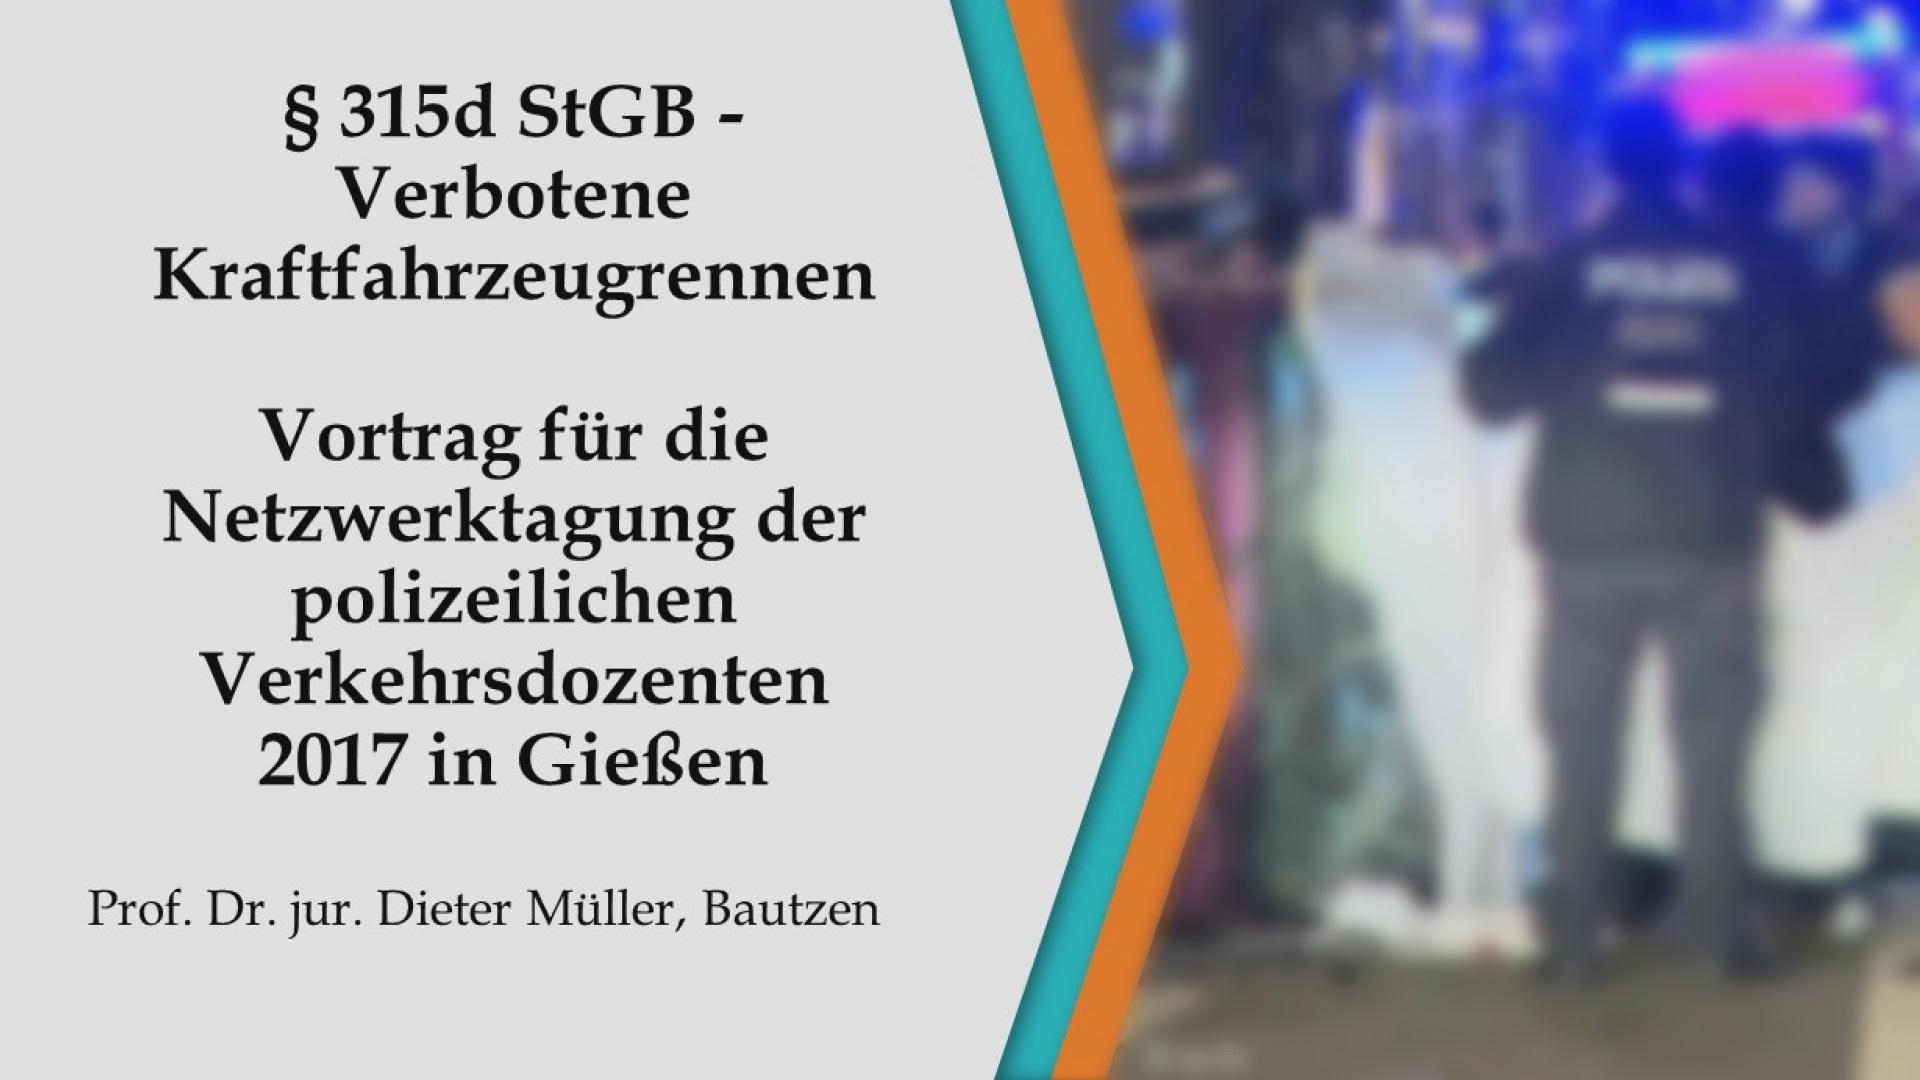 § 23 Stgb